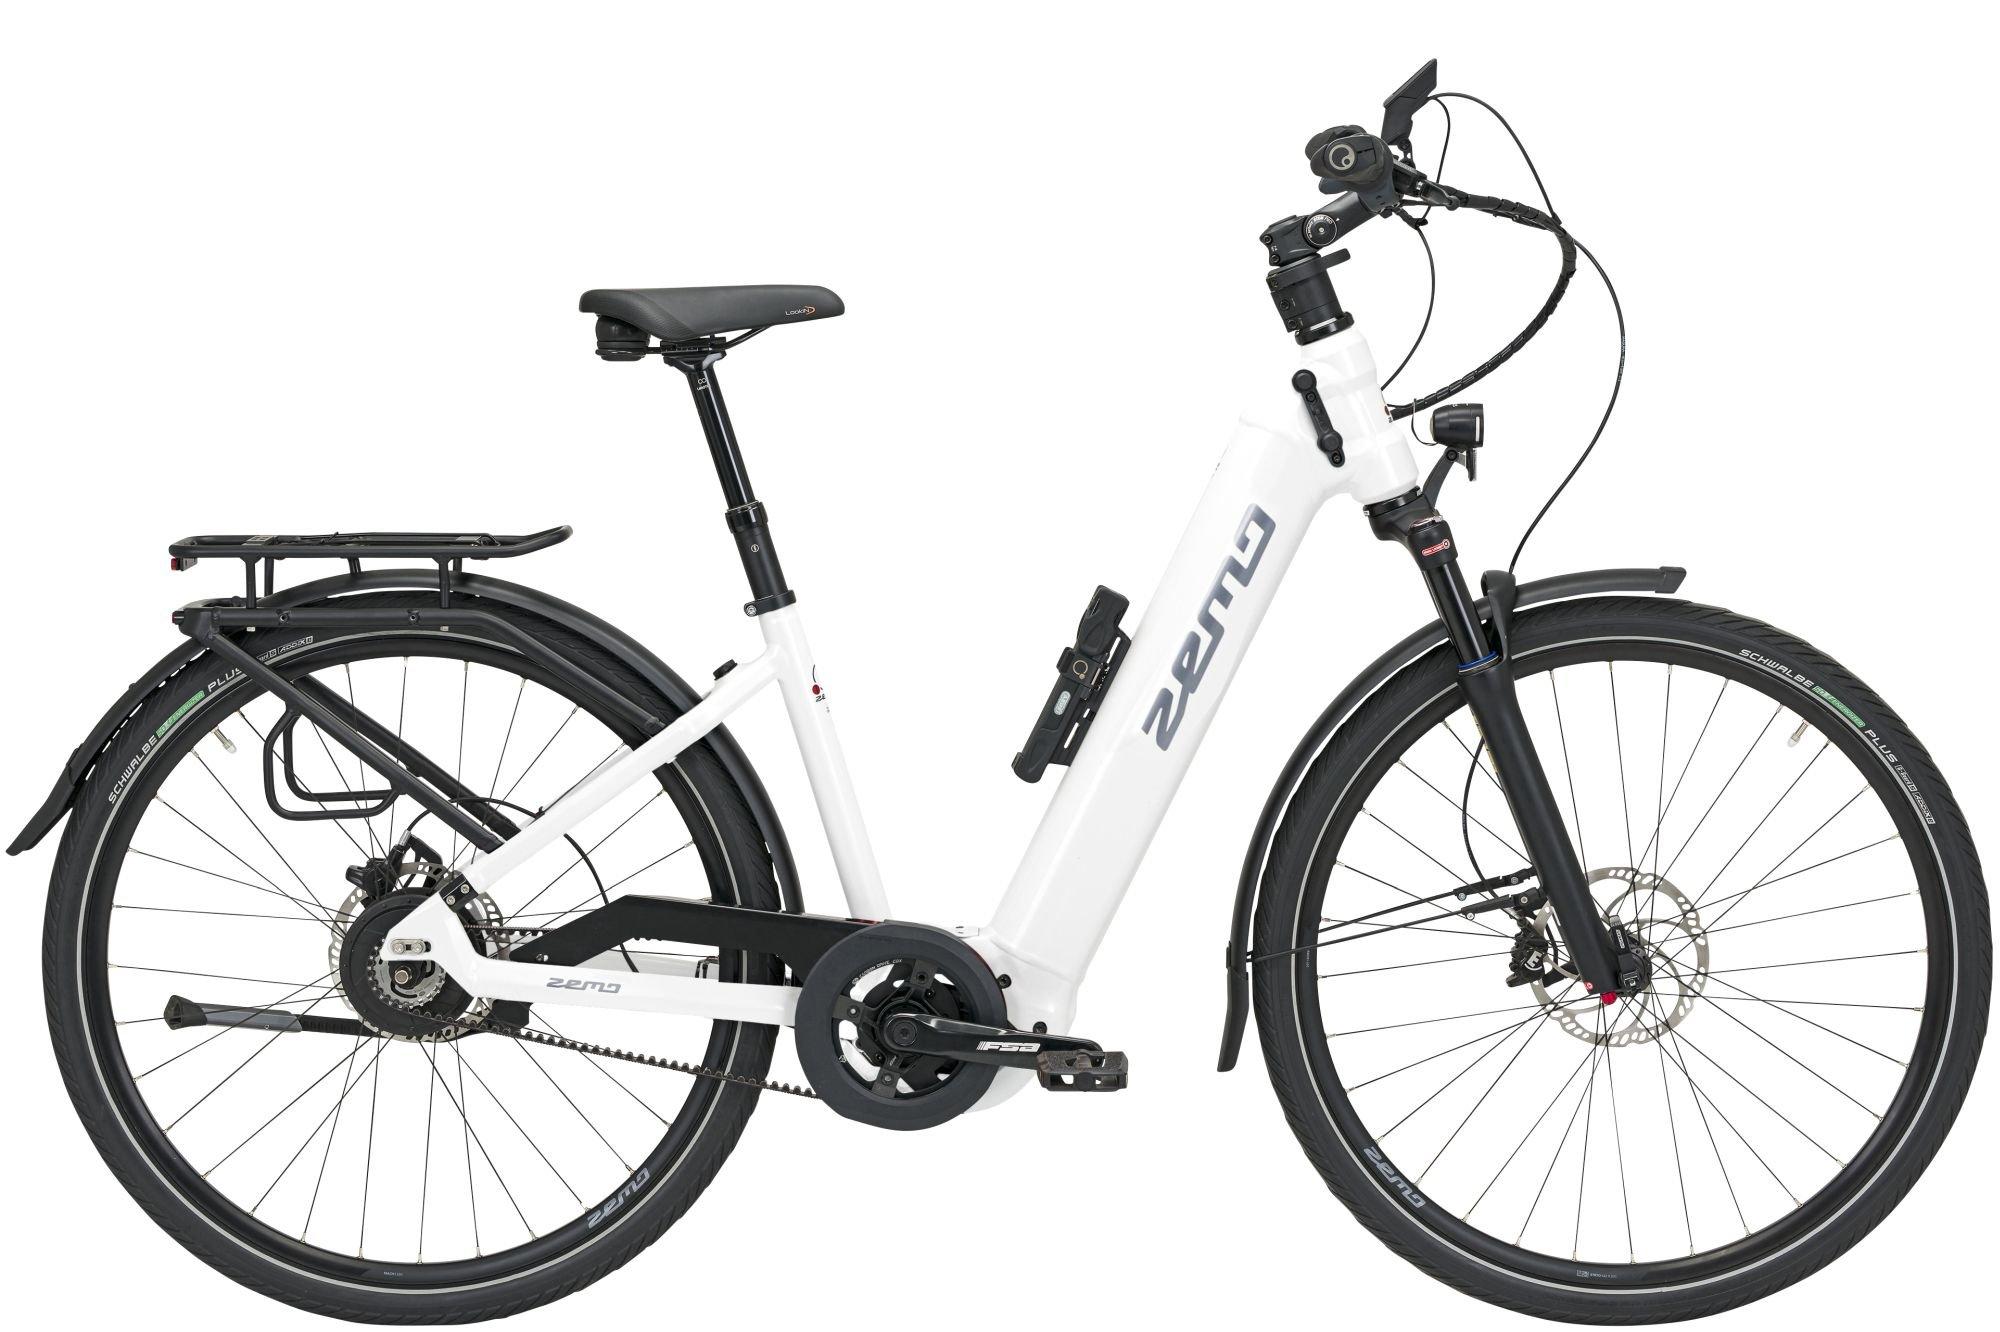 E-Bikes/Citybikes: ZEMO  ZE 10 F (625 Wh) stufenlose Nabenschaltung Damenfahrrad Wave Modell 2021 28 Zoll 43 cm